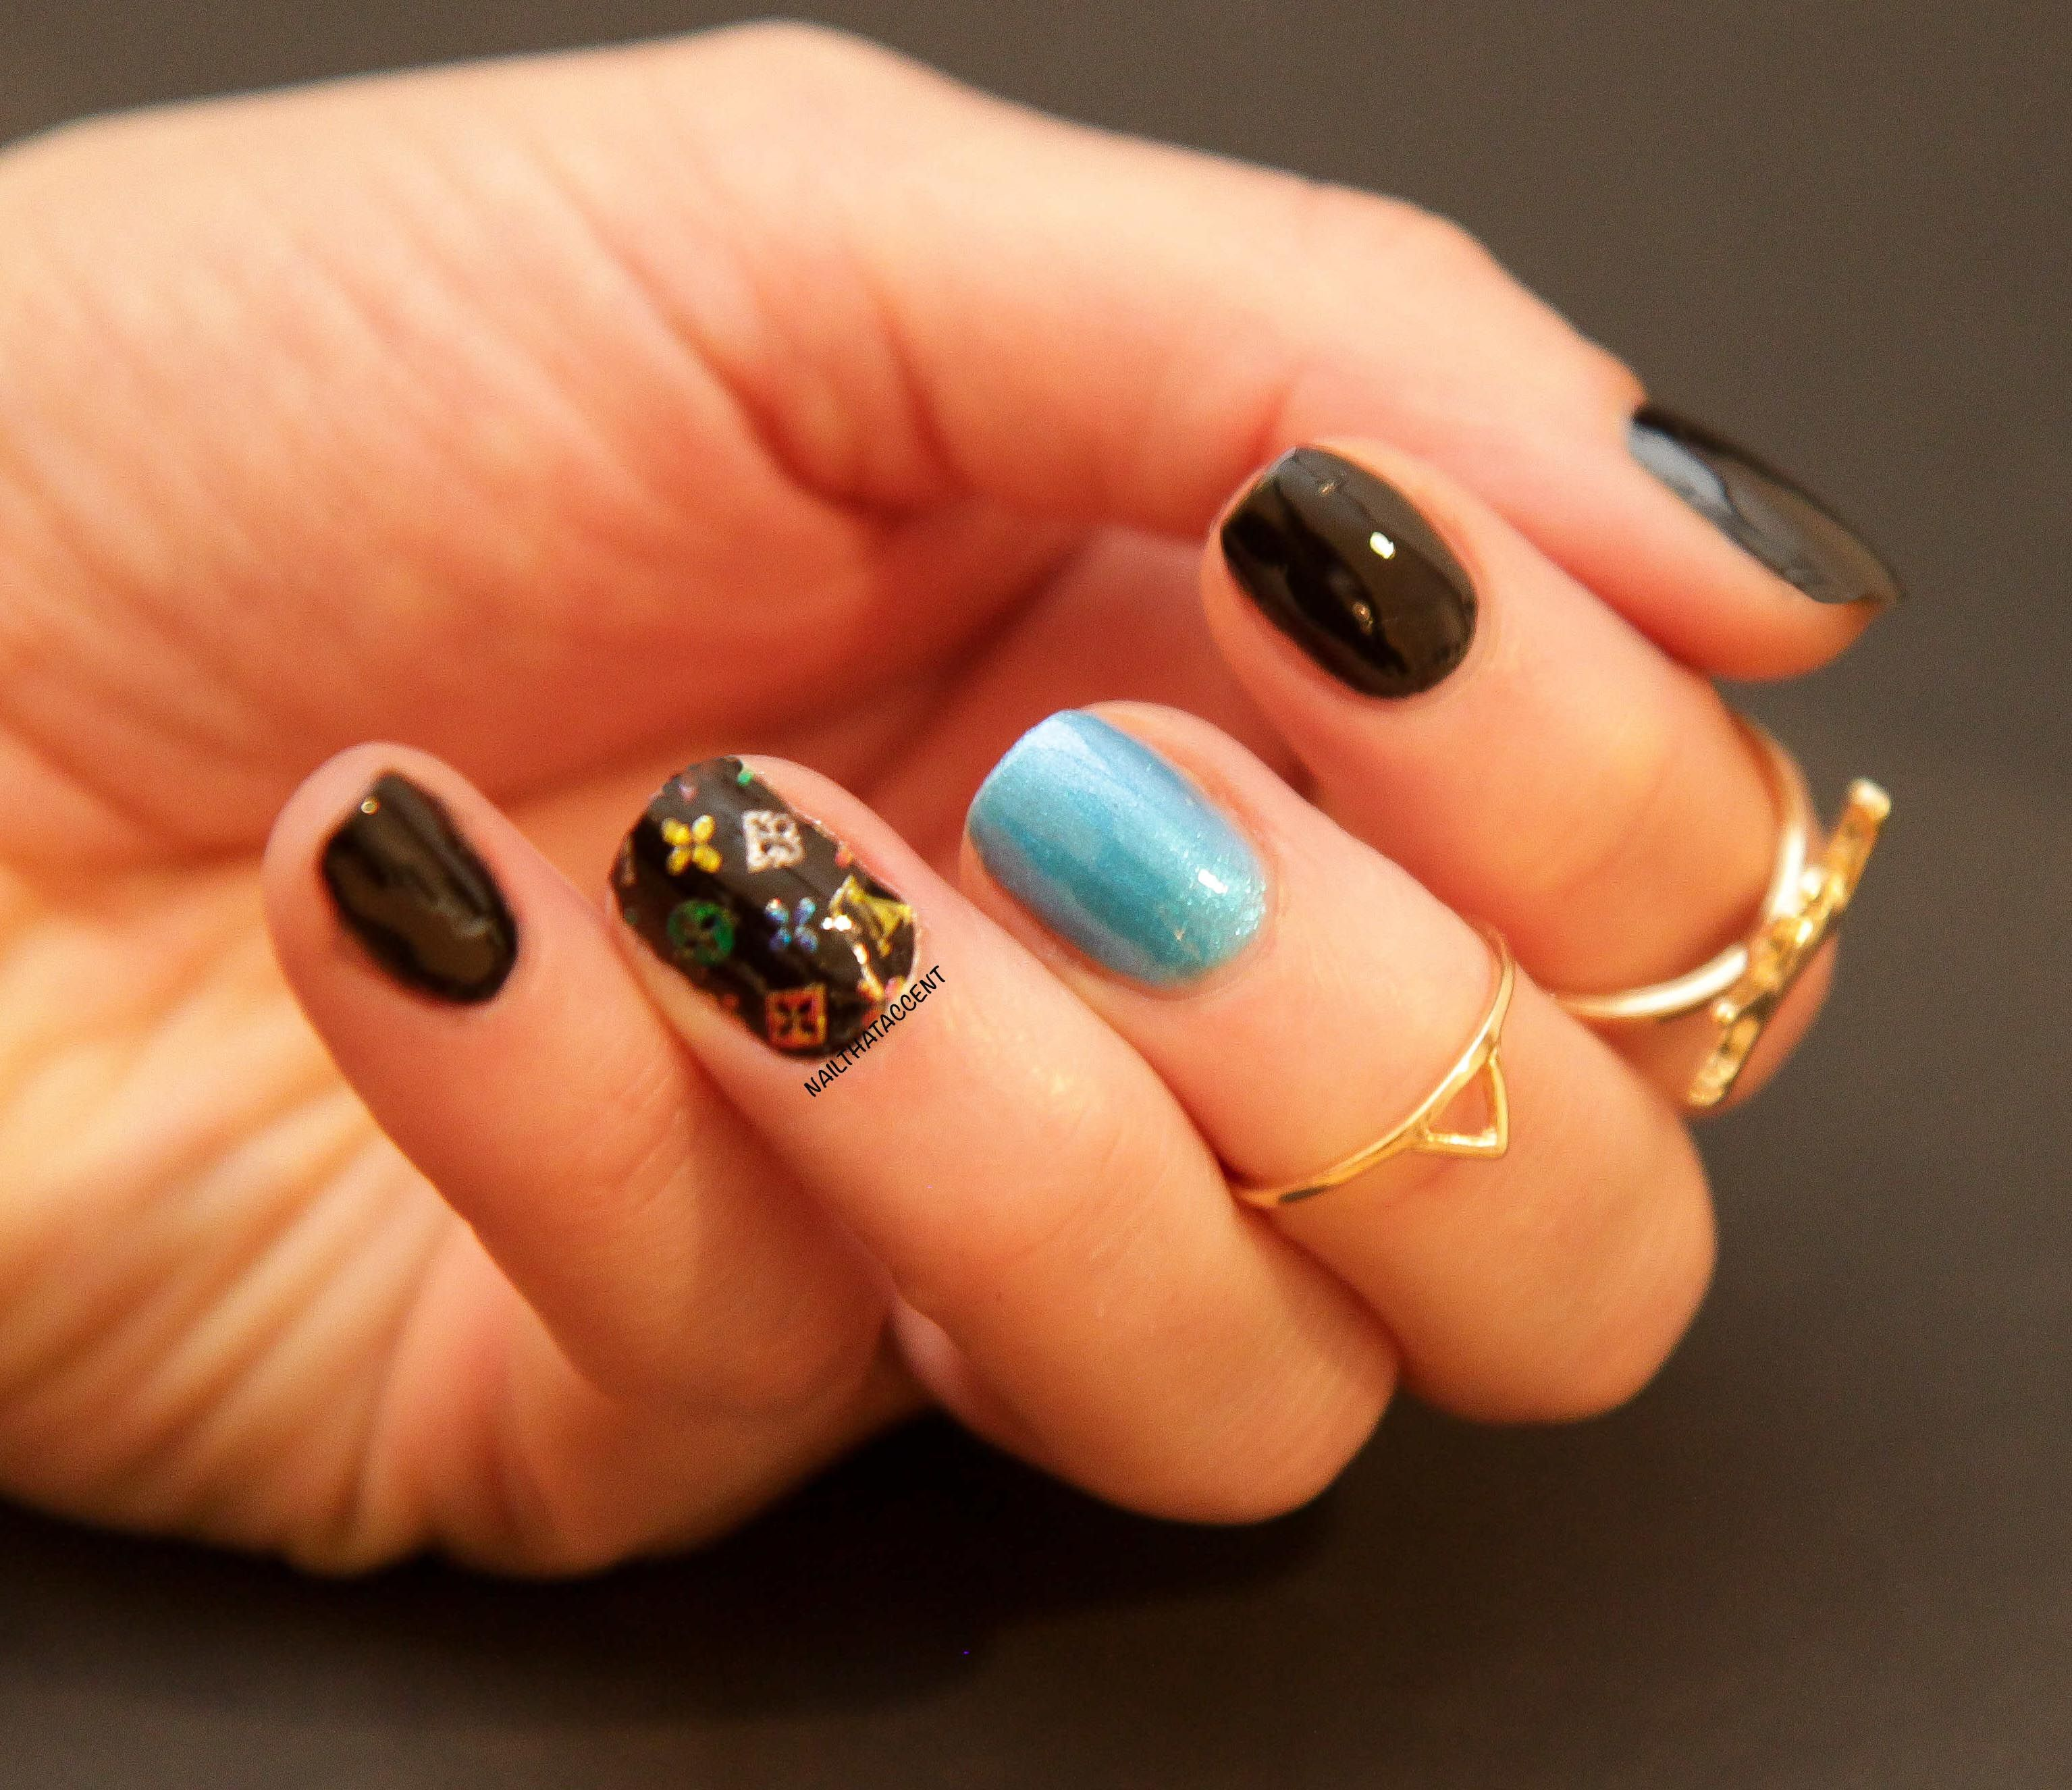 Louis Vuitton nail foils   Anything Goes Nails   Pinterest   Nail ...